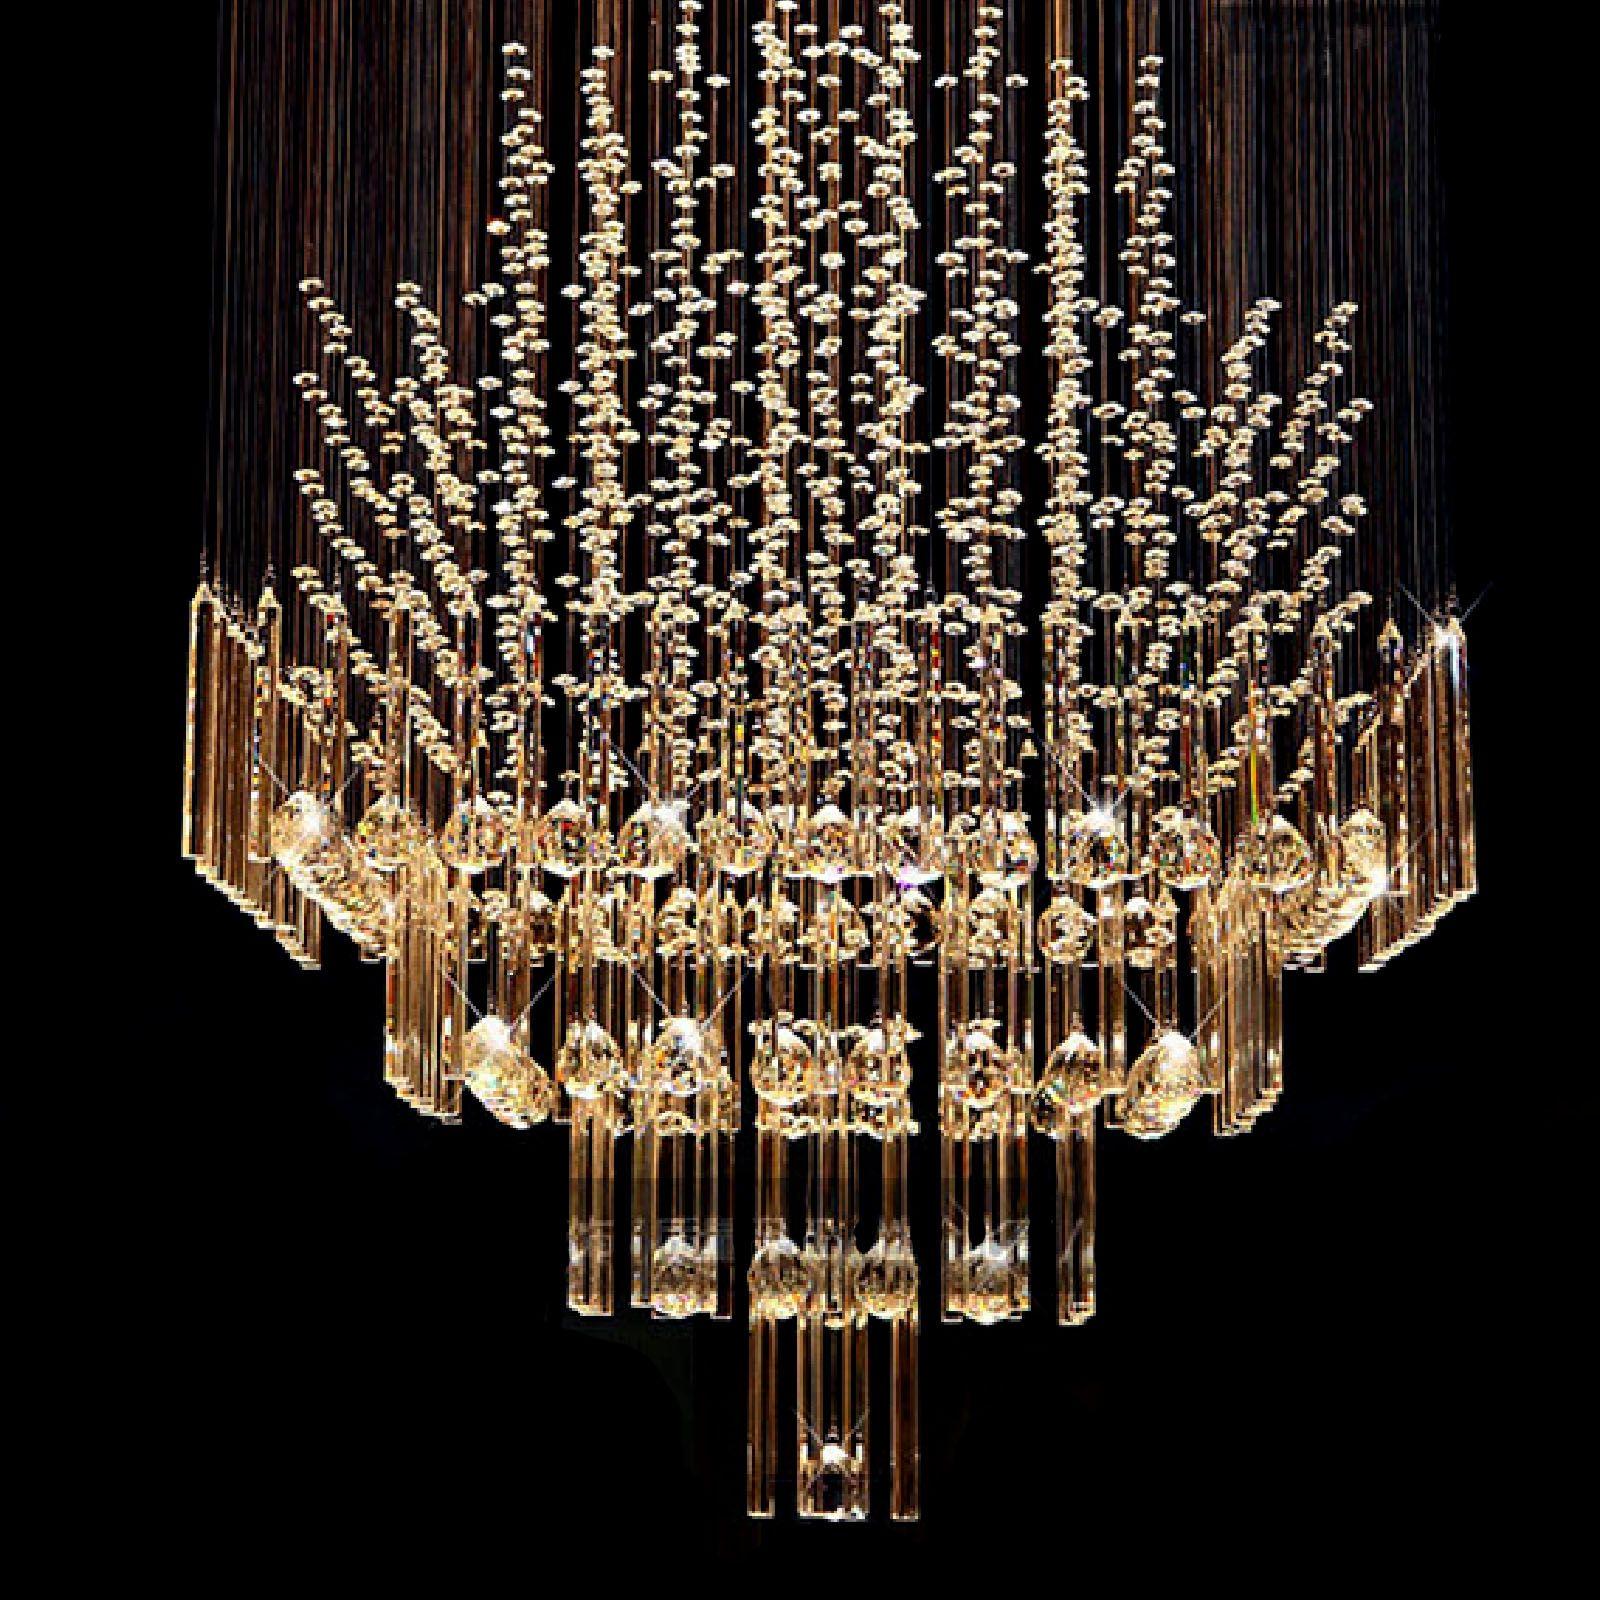 Byb 174 Modern Chandelier Rain Drop Lighting Square Crystal